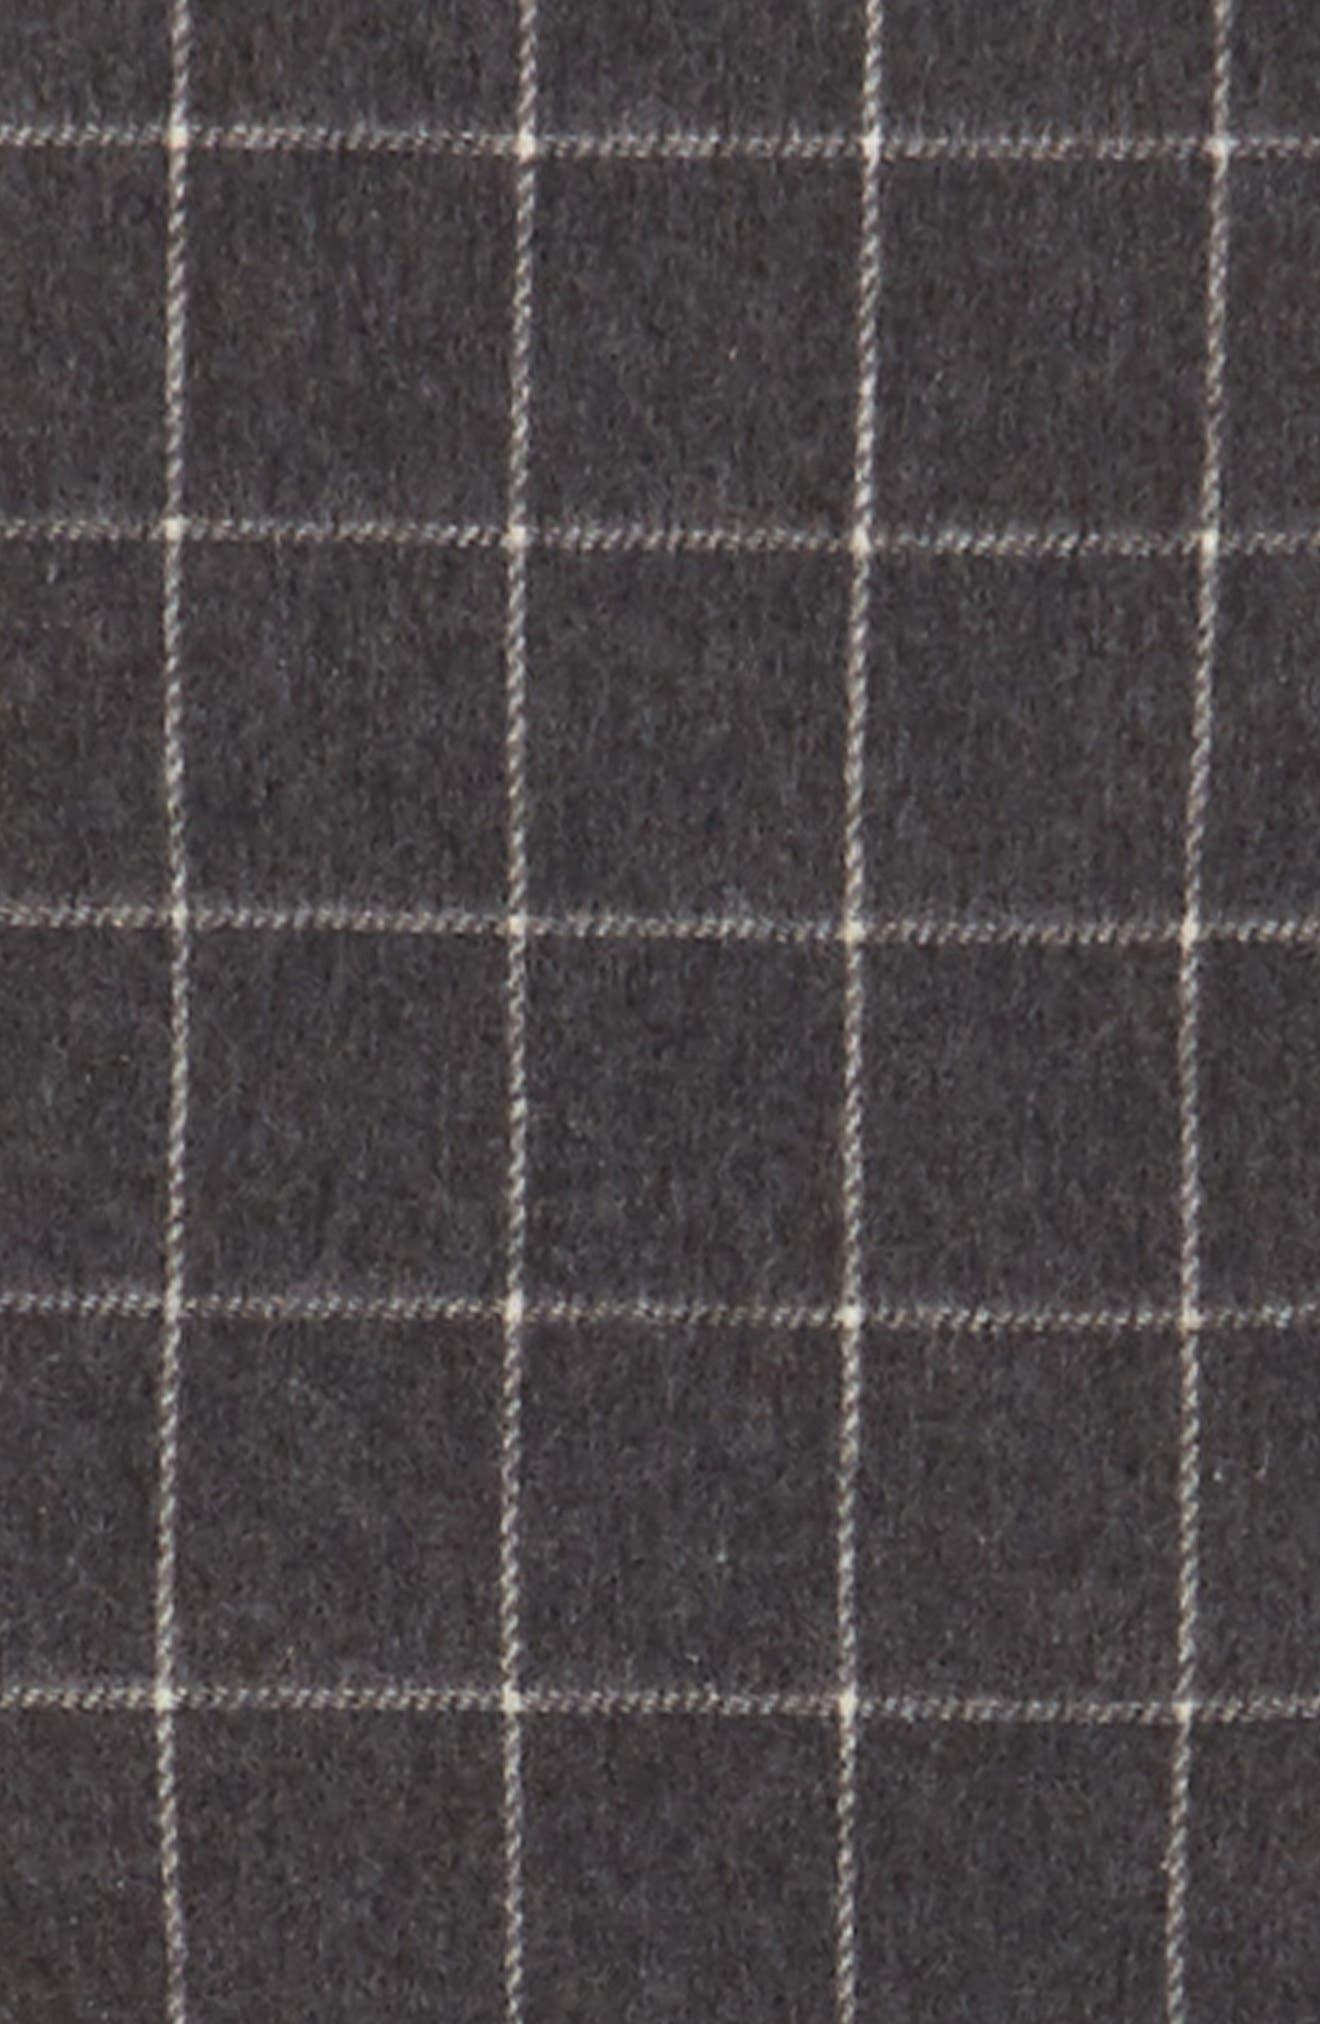 Alternate Image 3  - Polo Ralph Lauren Reversible Wool Blend Plaid Scarf